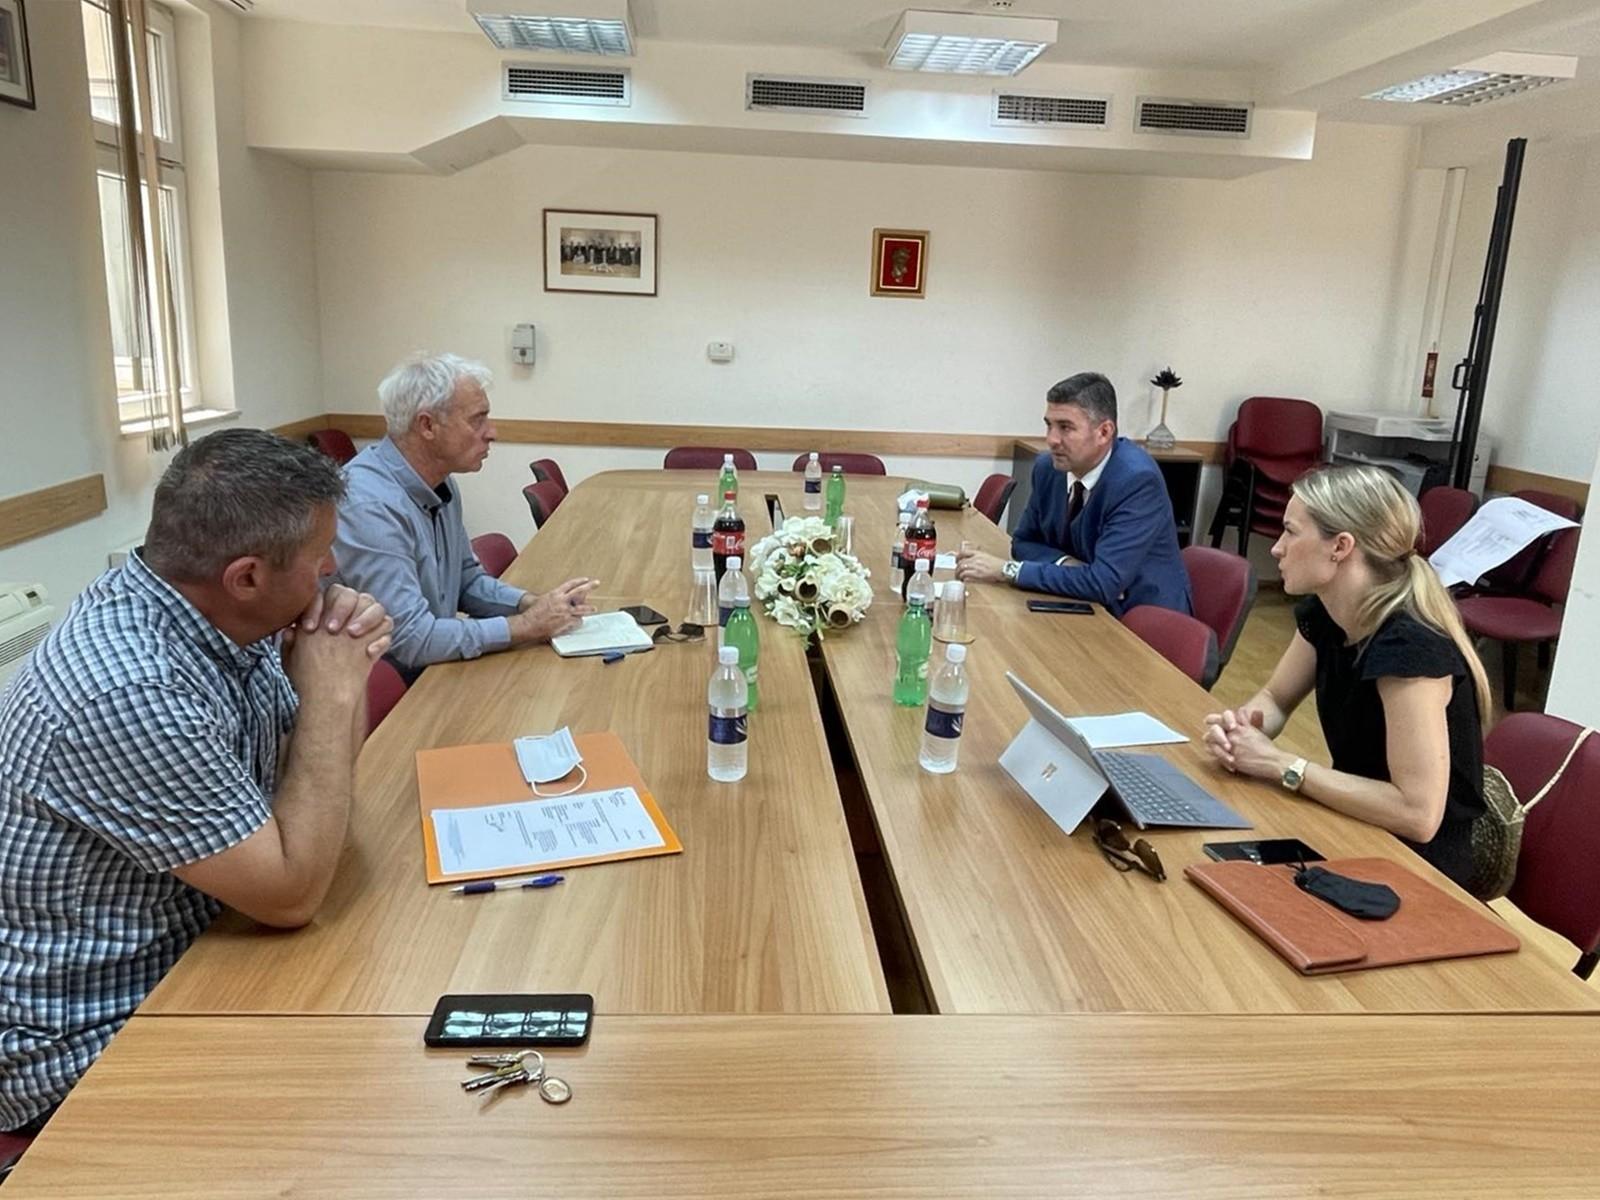 Gradonačelnik Franković i načelnik Nardelli o modelima financiranja groblja Dubac